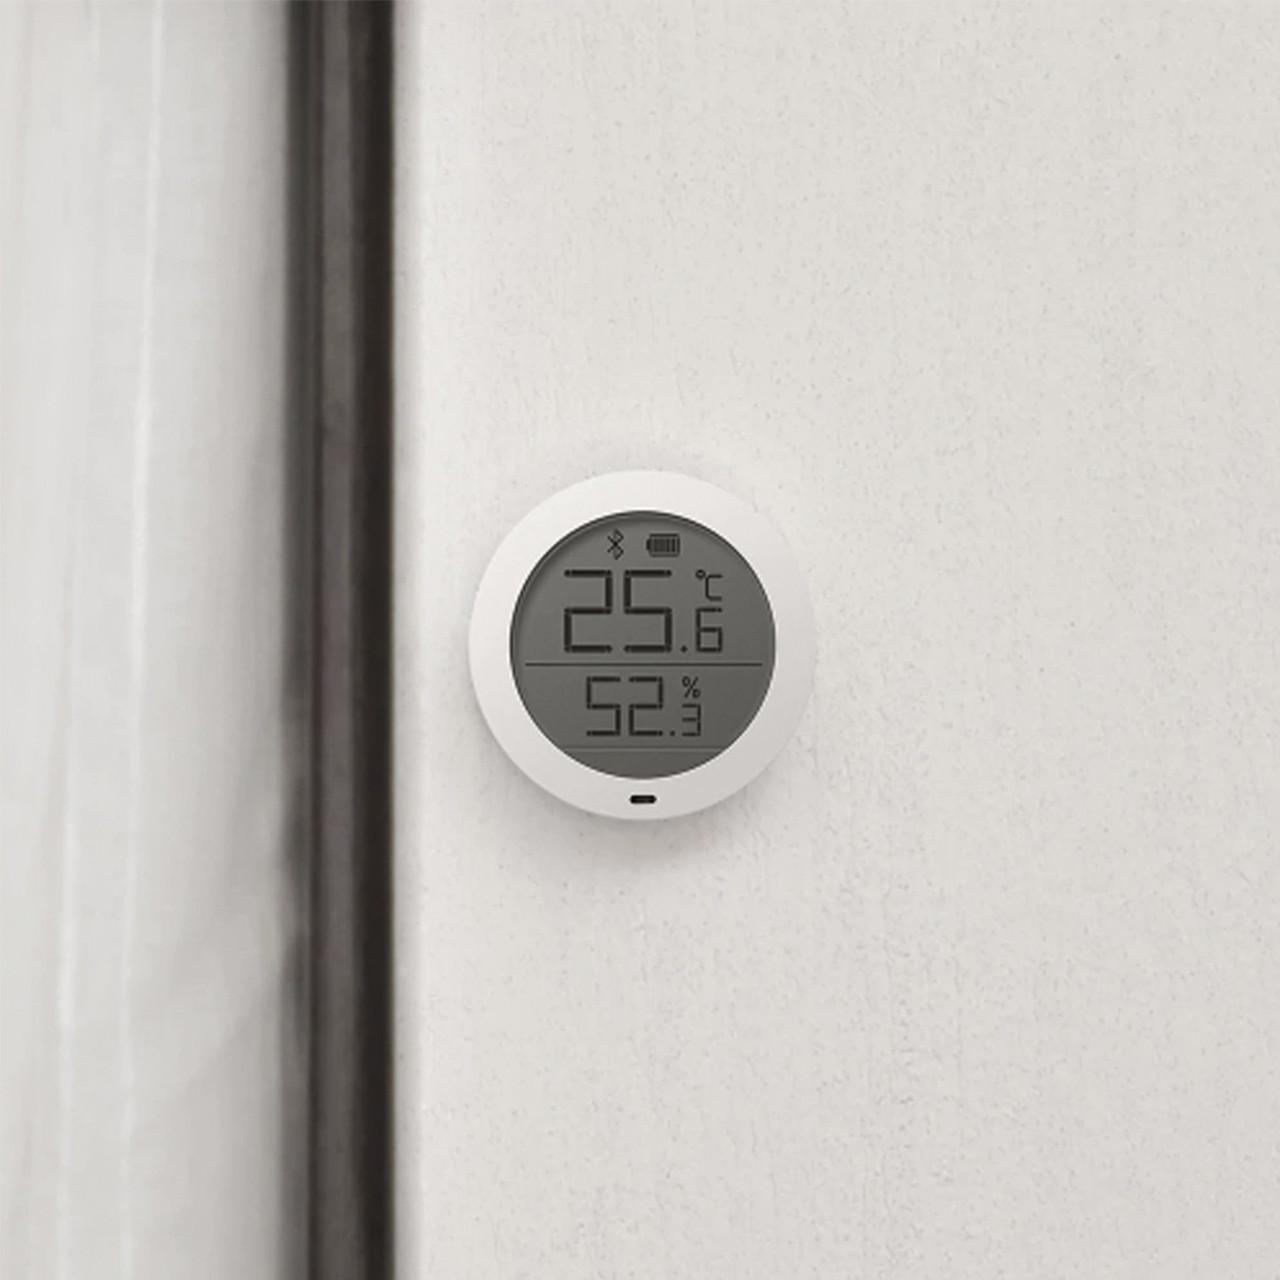 Xiaomi MiJia Temperature & Humidity Monitor Умный датчик температуры и влажности